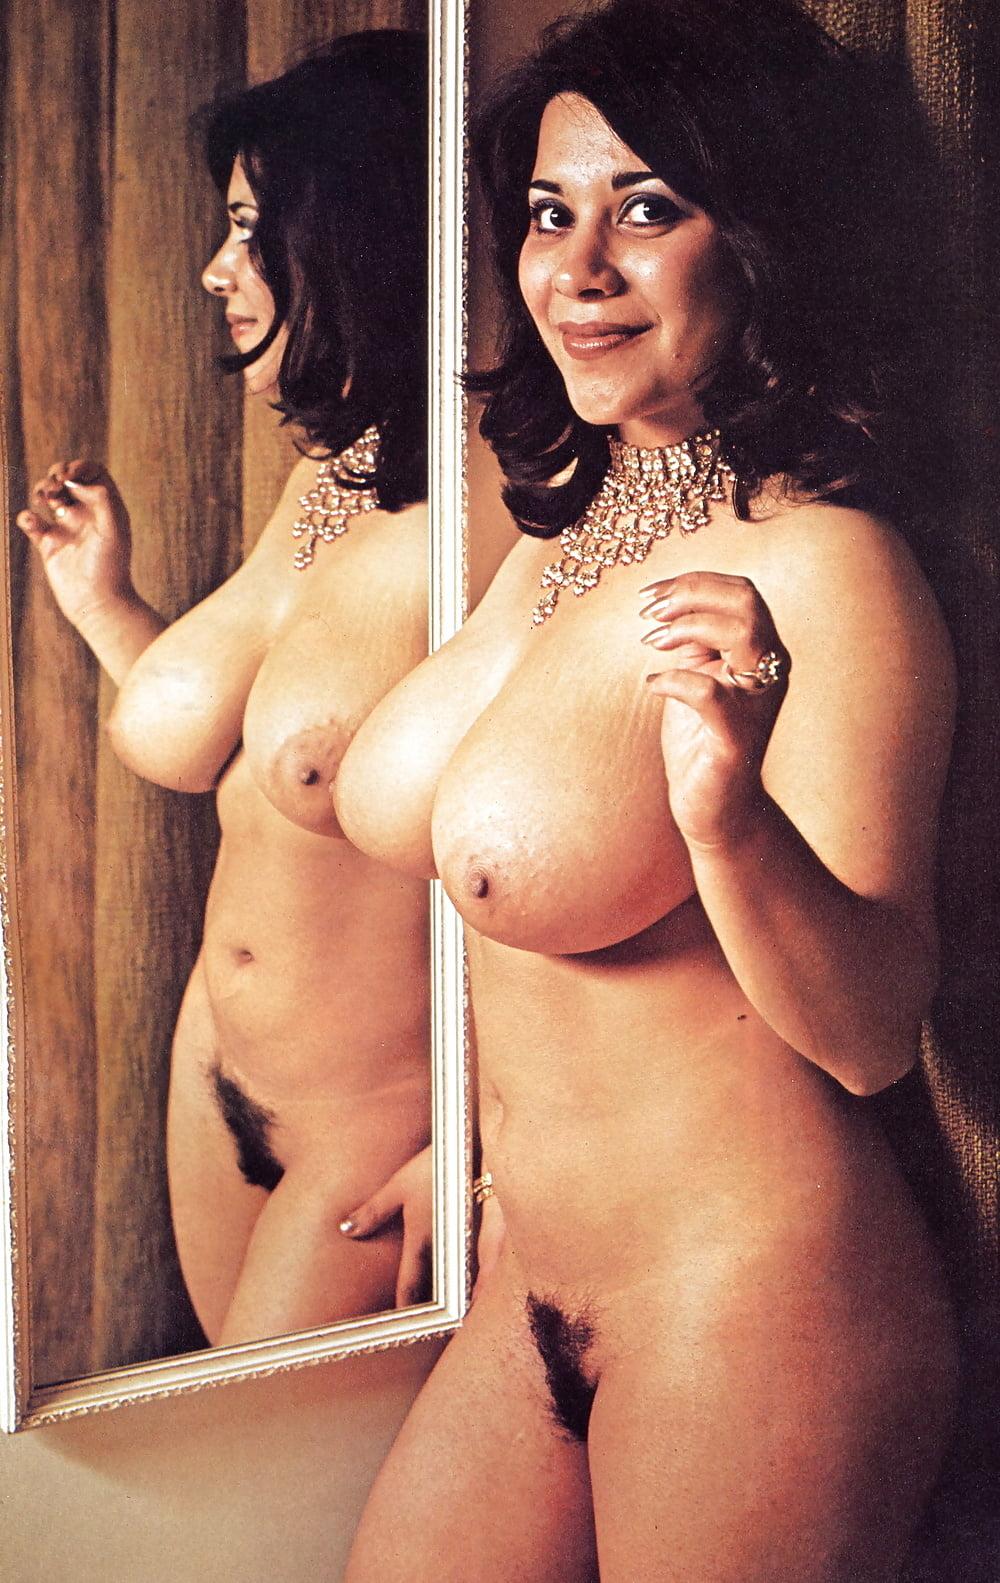 nude-busty-hot-vintage-pornstar-girls-fake-pics